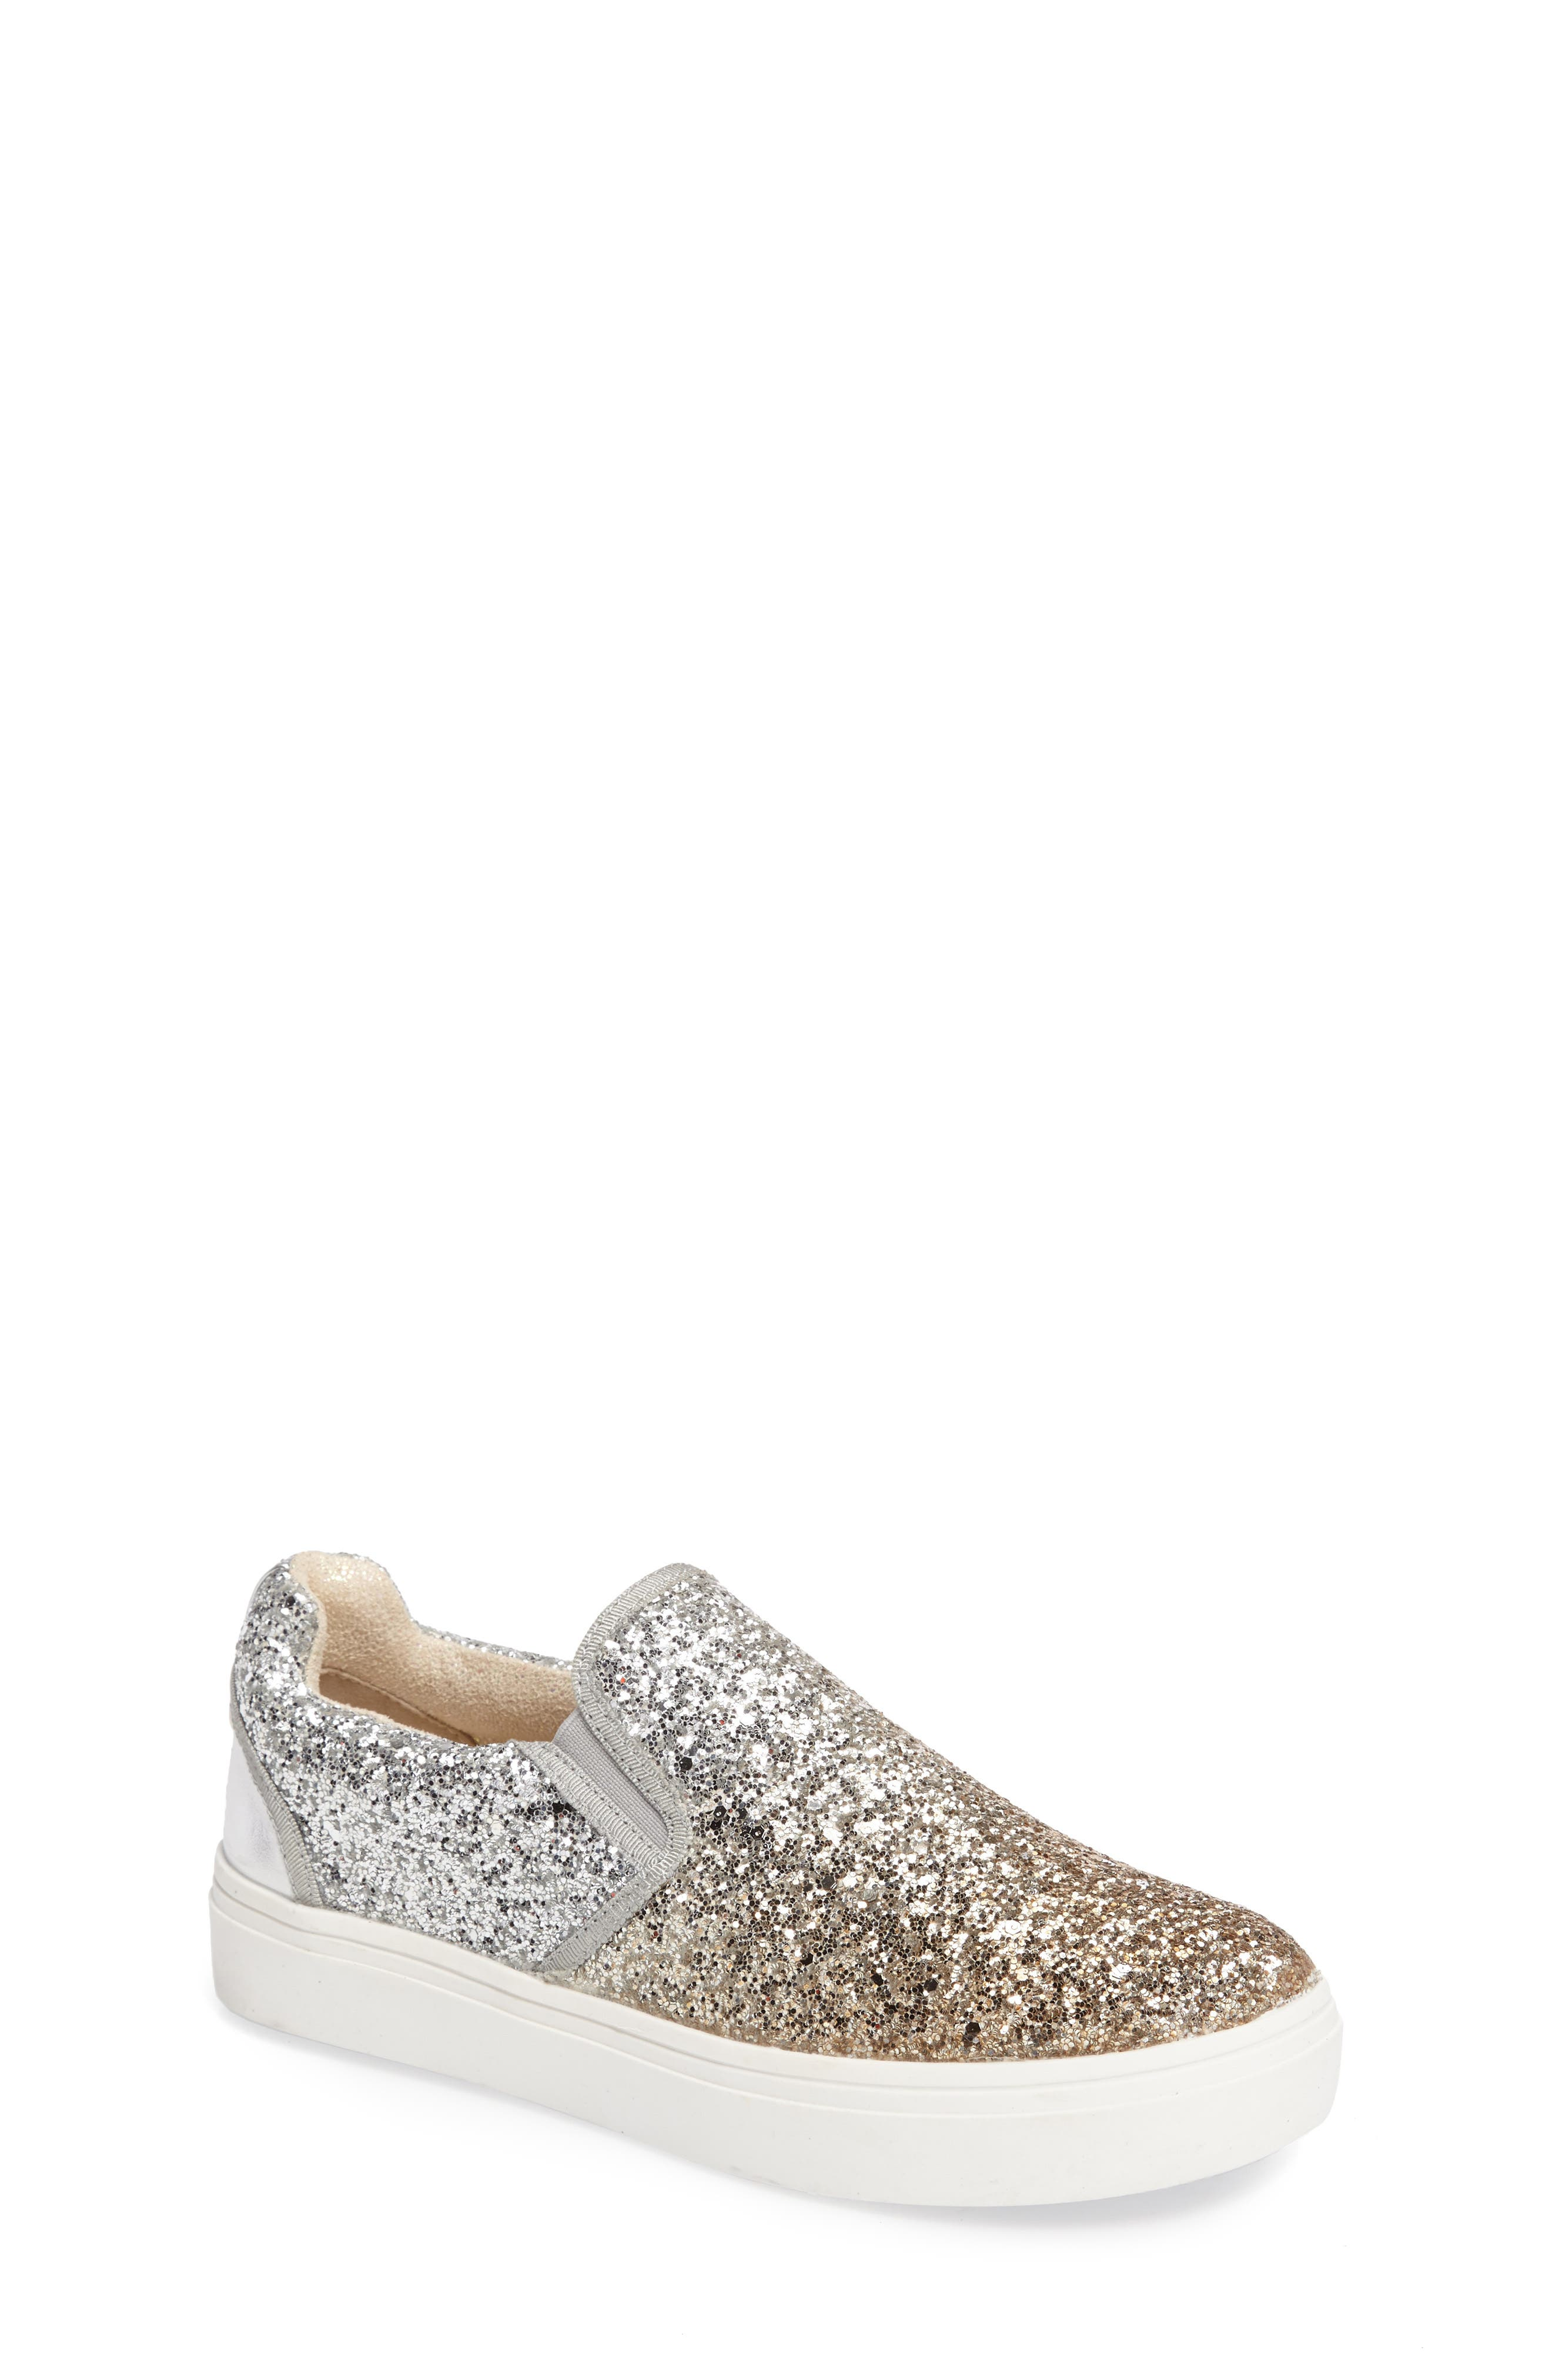 Double Marcia Glitter Platform Sneaker,                             Main thumbnail 1, color,                             040